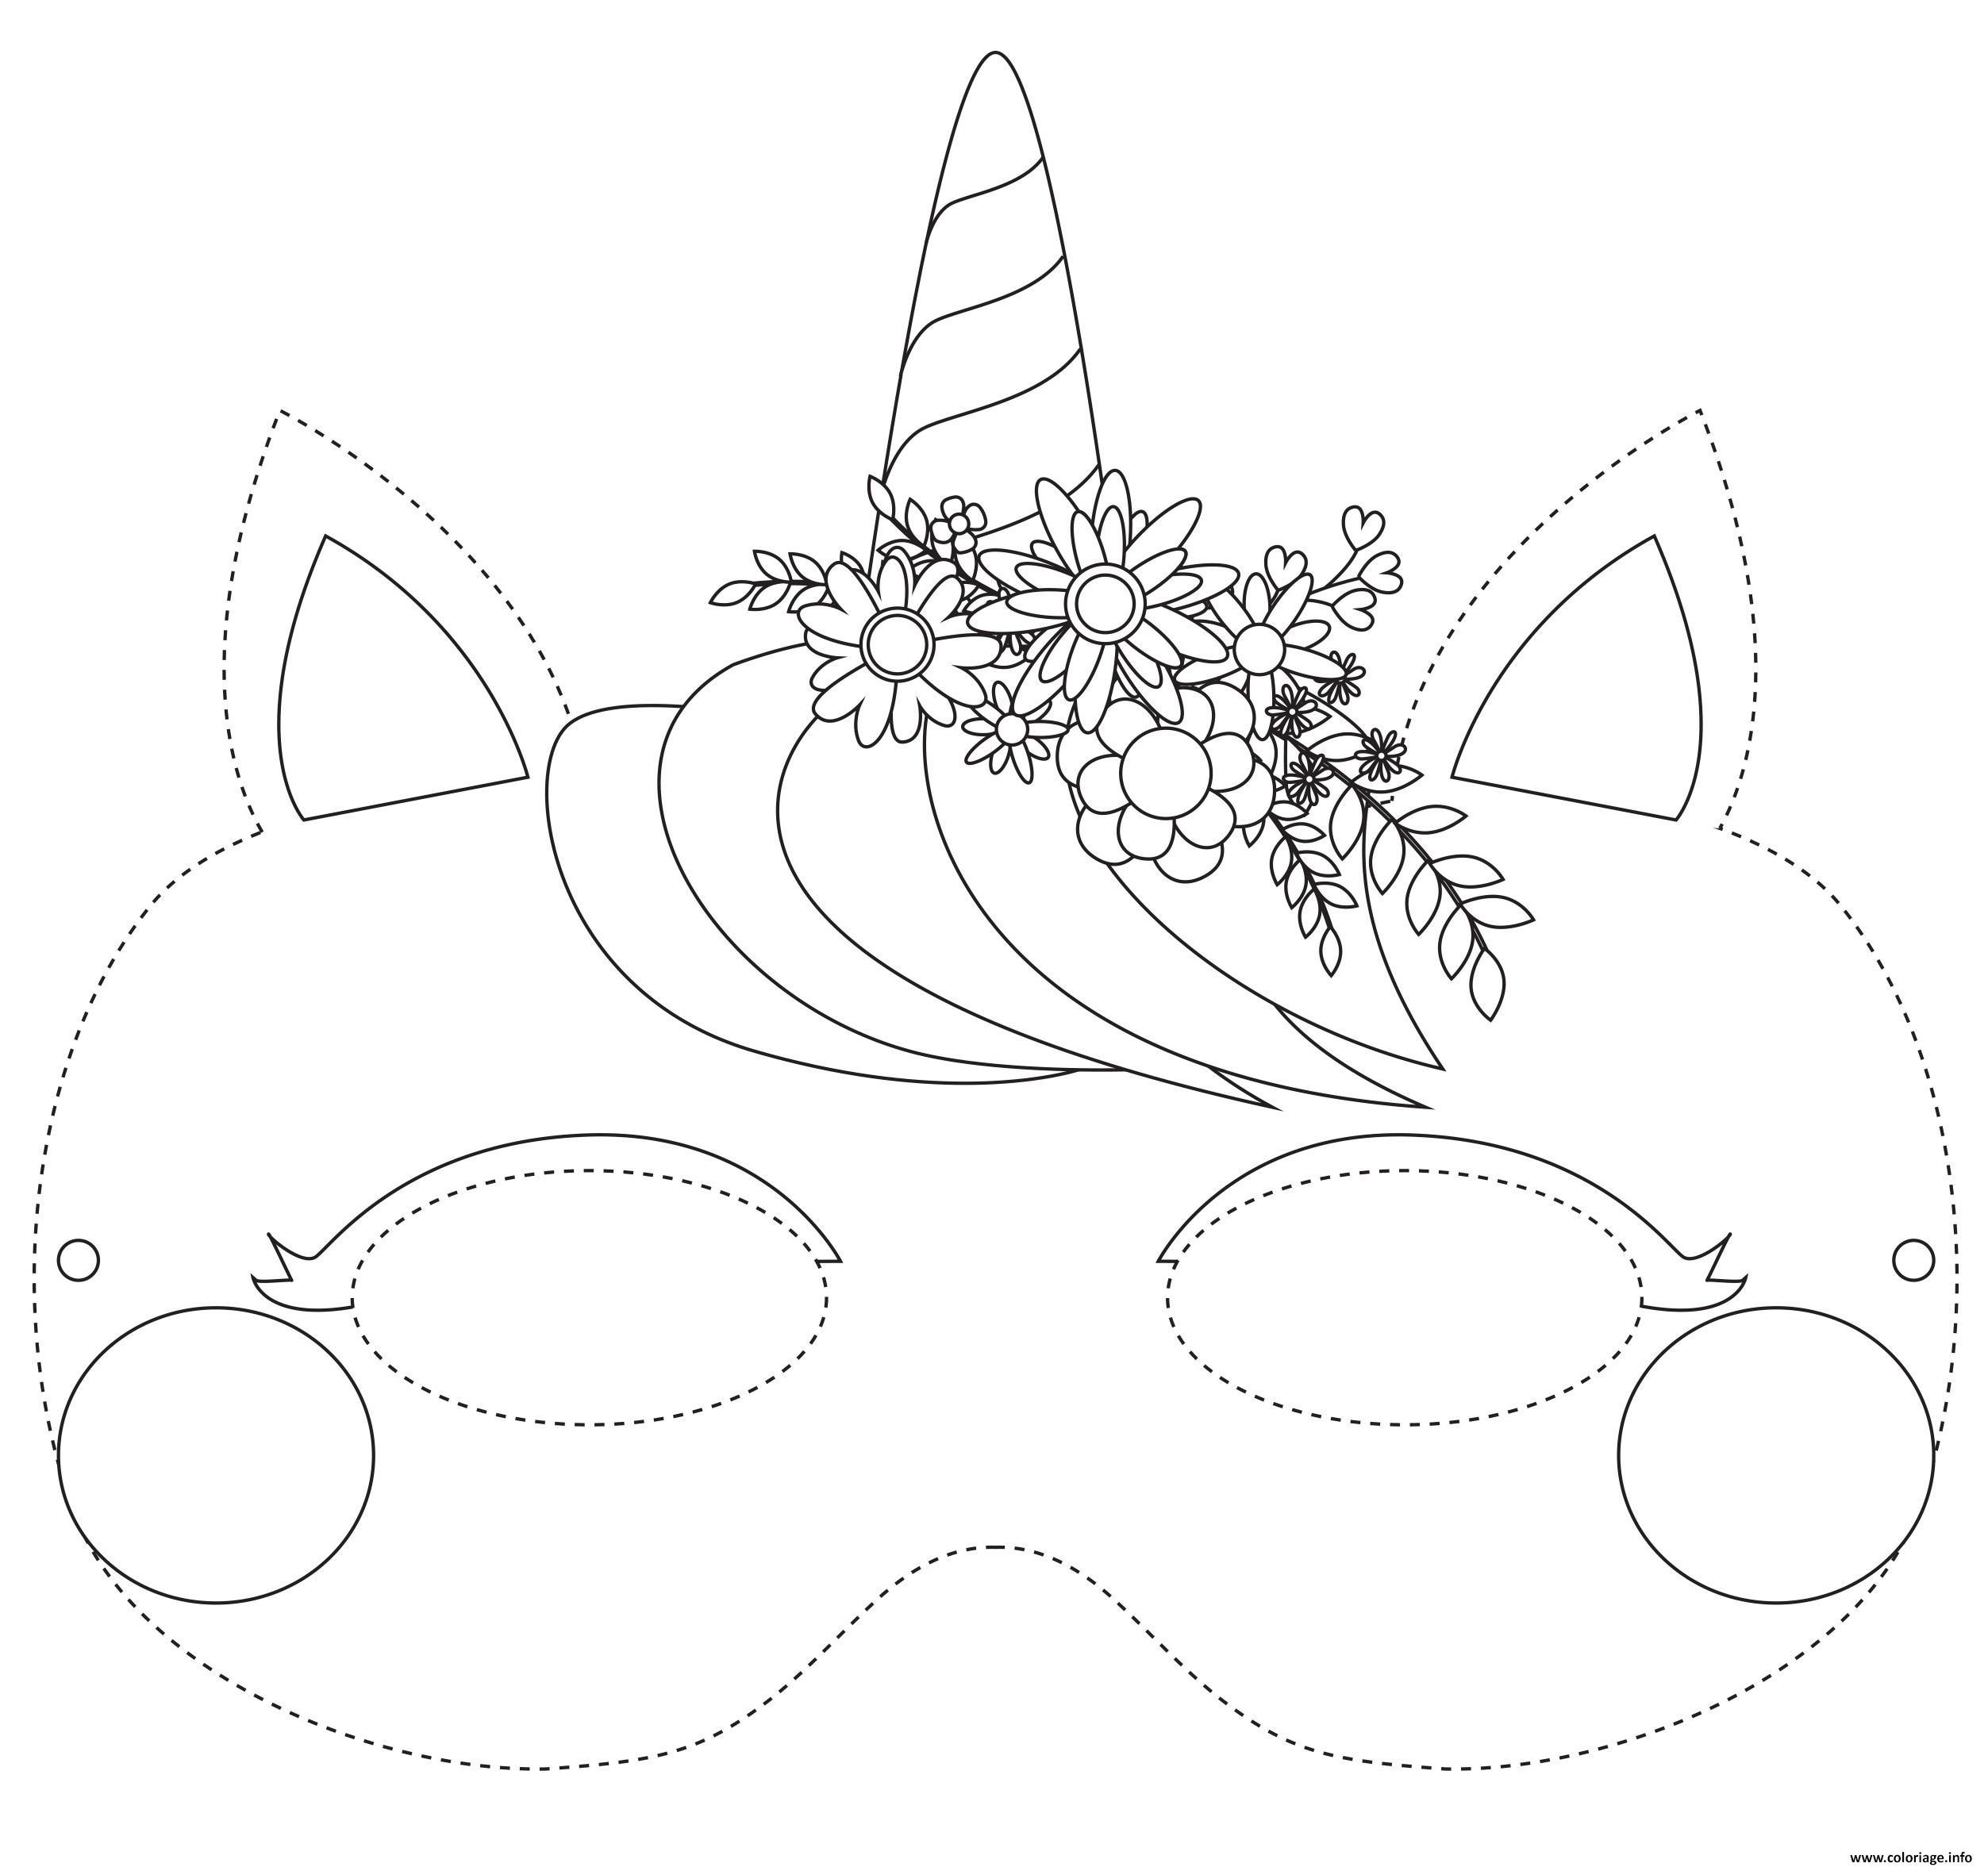 Coloriage Masque De Licorne A Colorier Dessin Masque A Imprimer